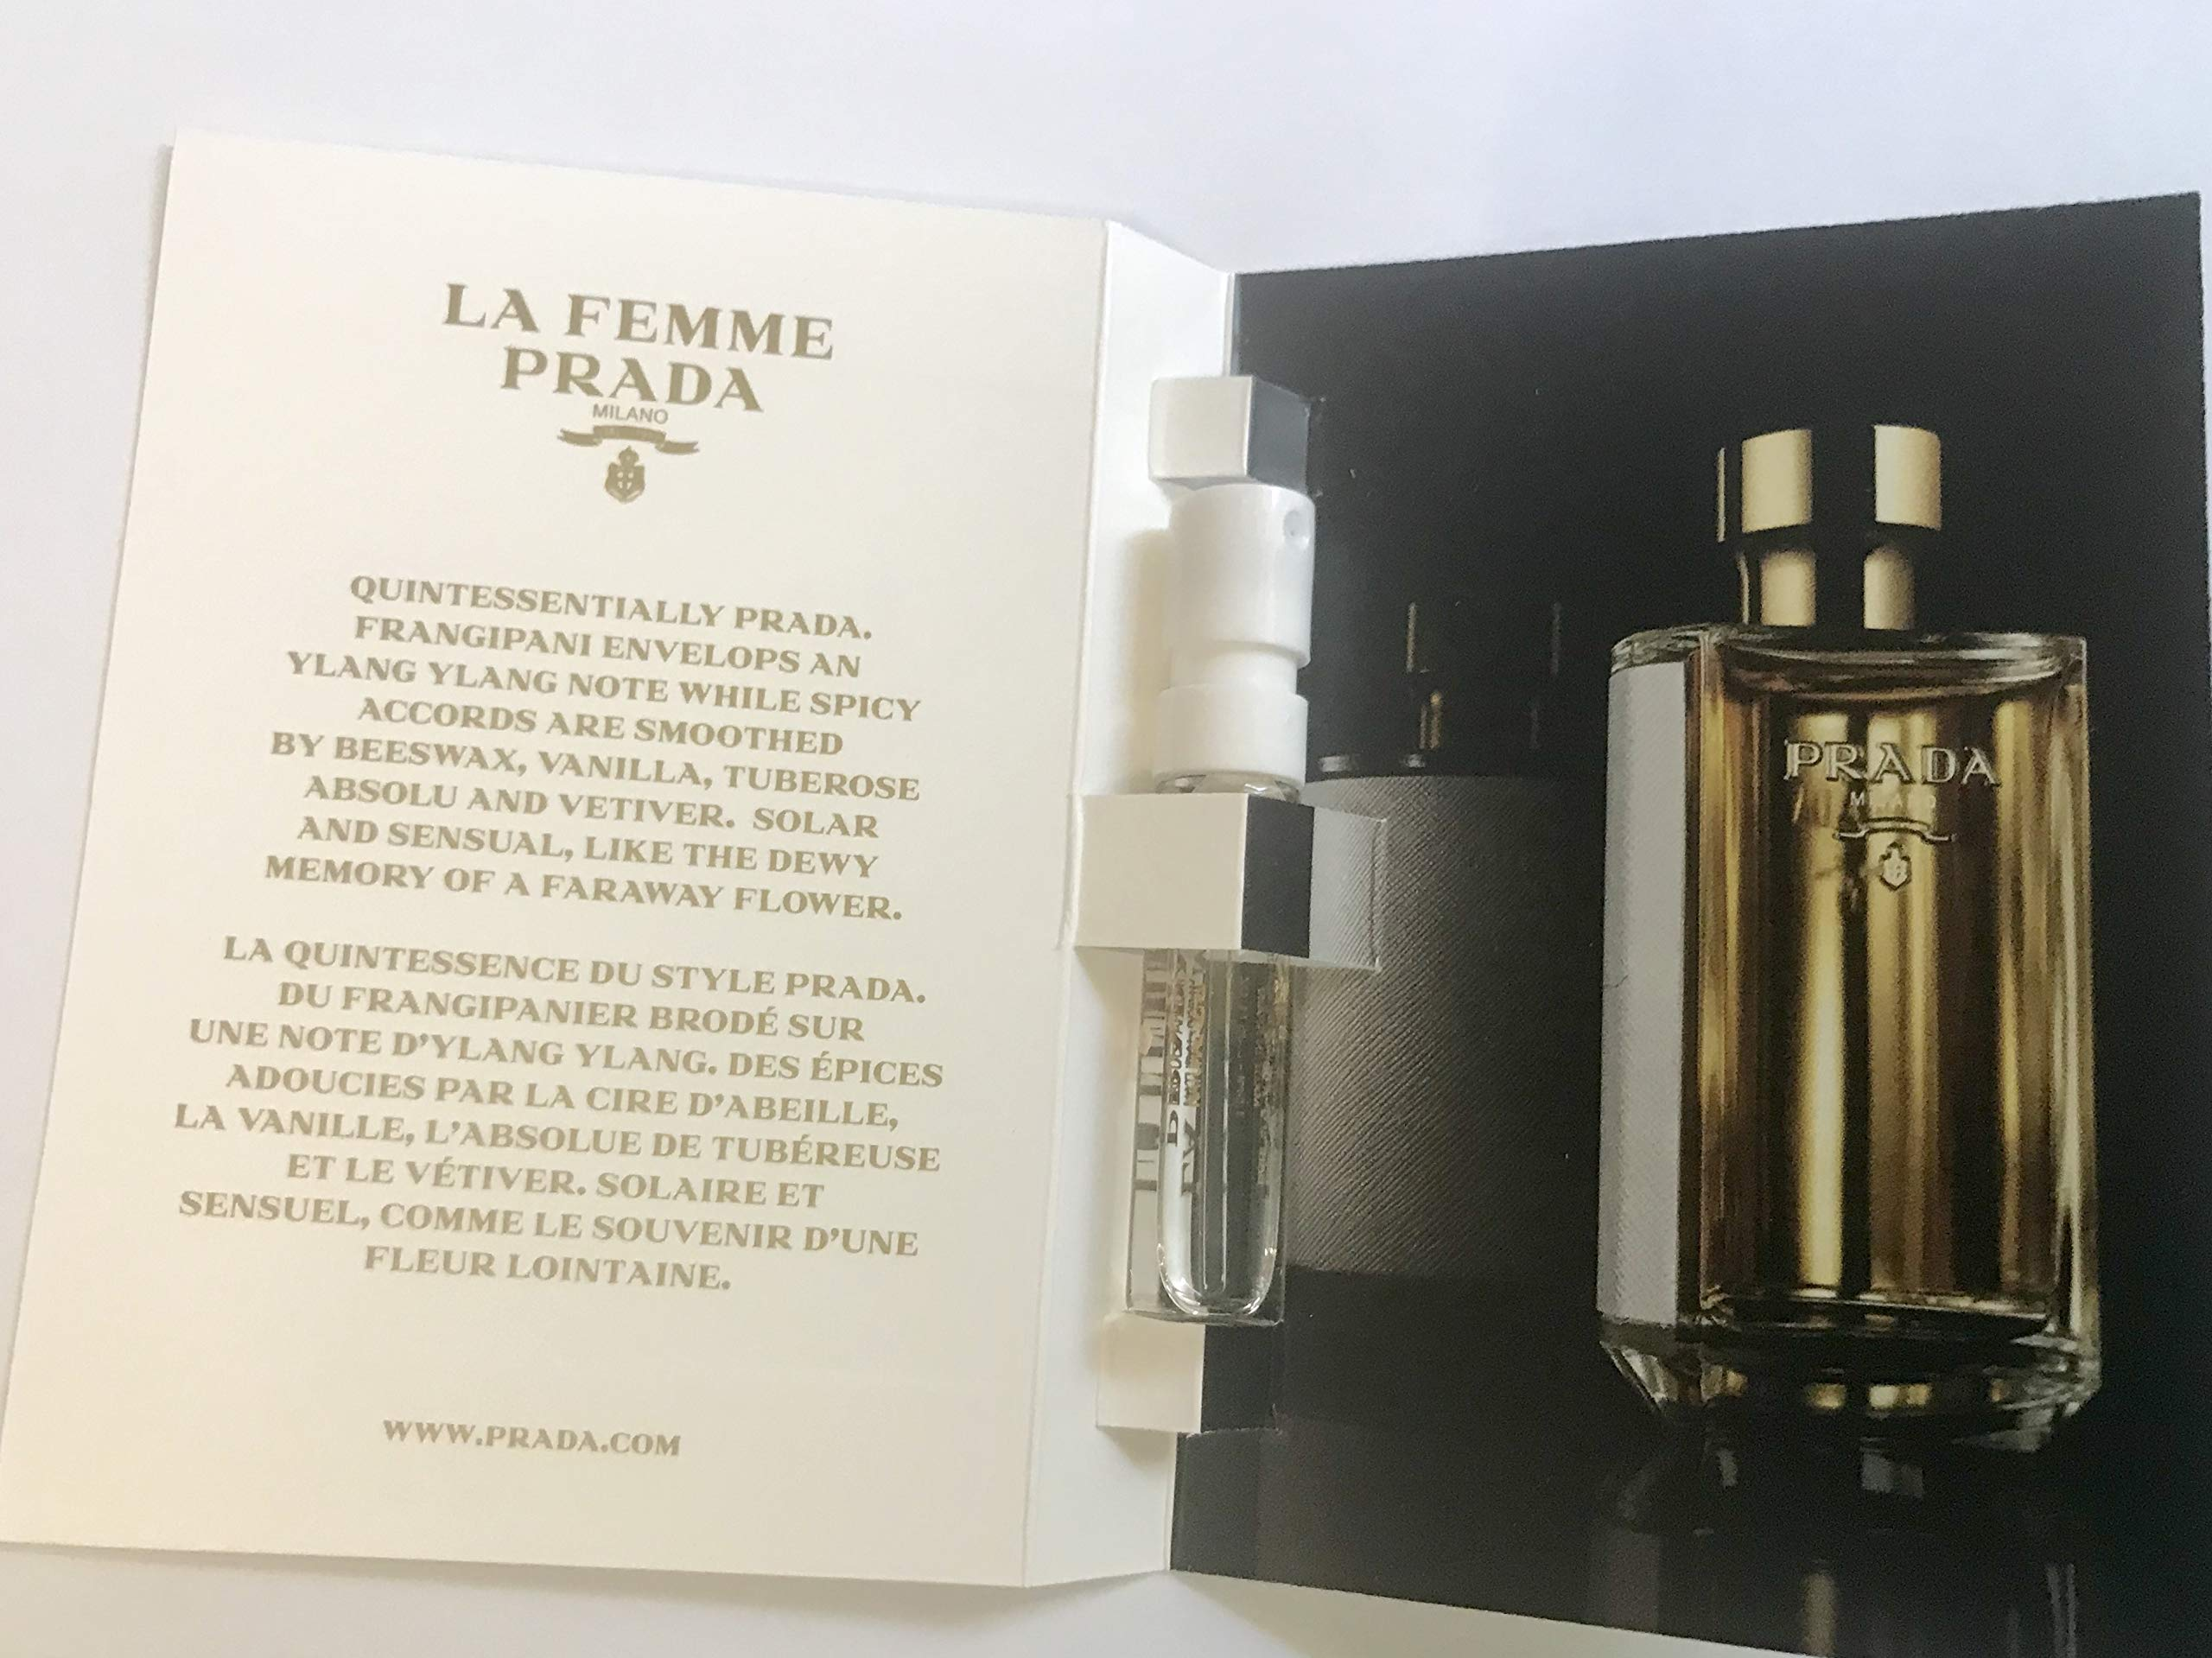 d77cd50bb6dd Amazon.com   Prada La Femme Eau De Parfum Spray, 3.4 Fluid Ounce ...